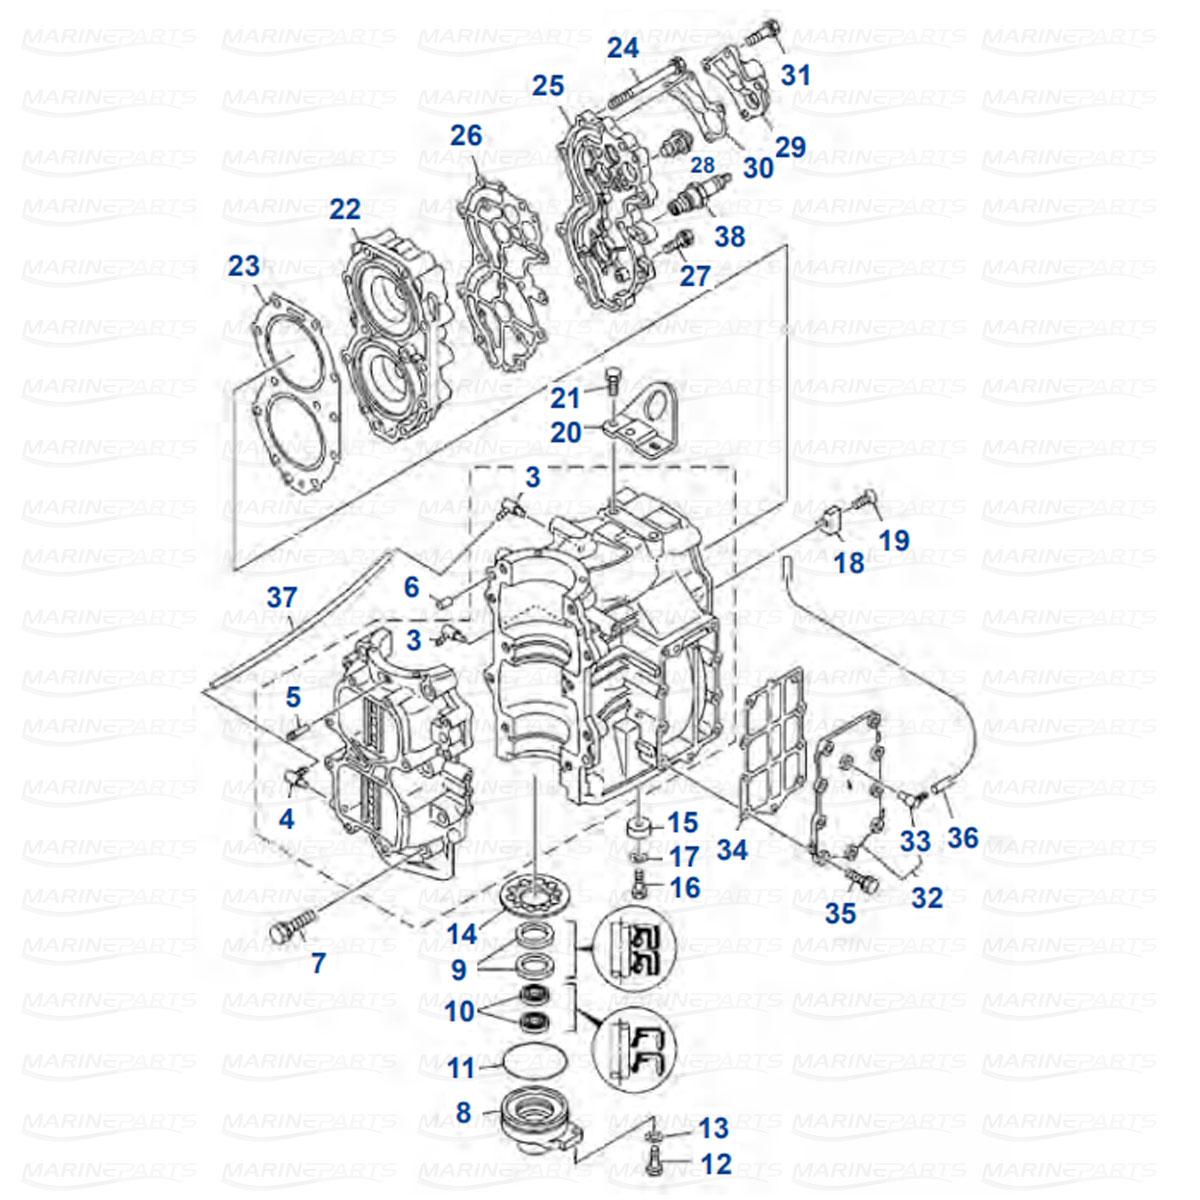 Moottorin sisäosia Yamaha E40X - 40X